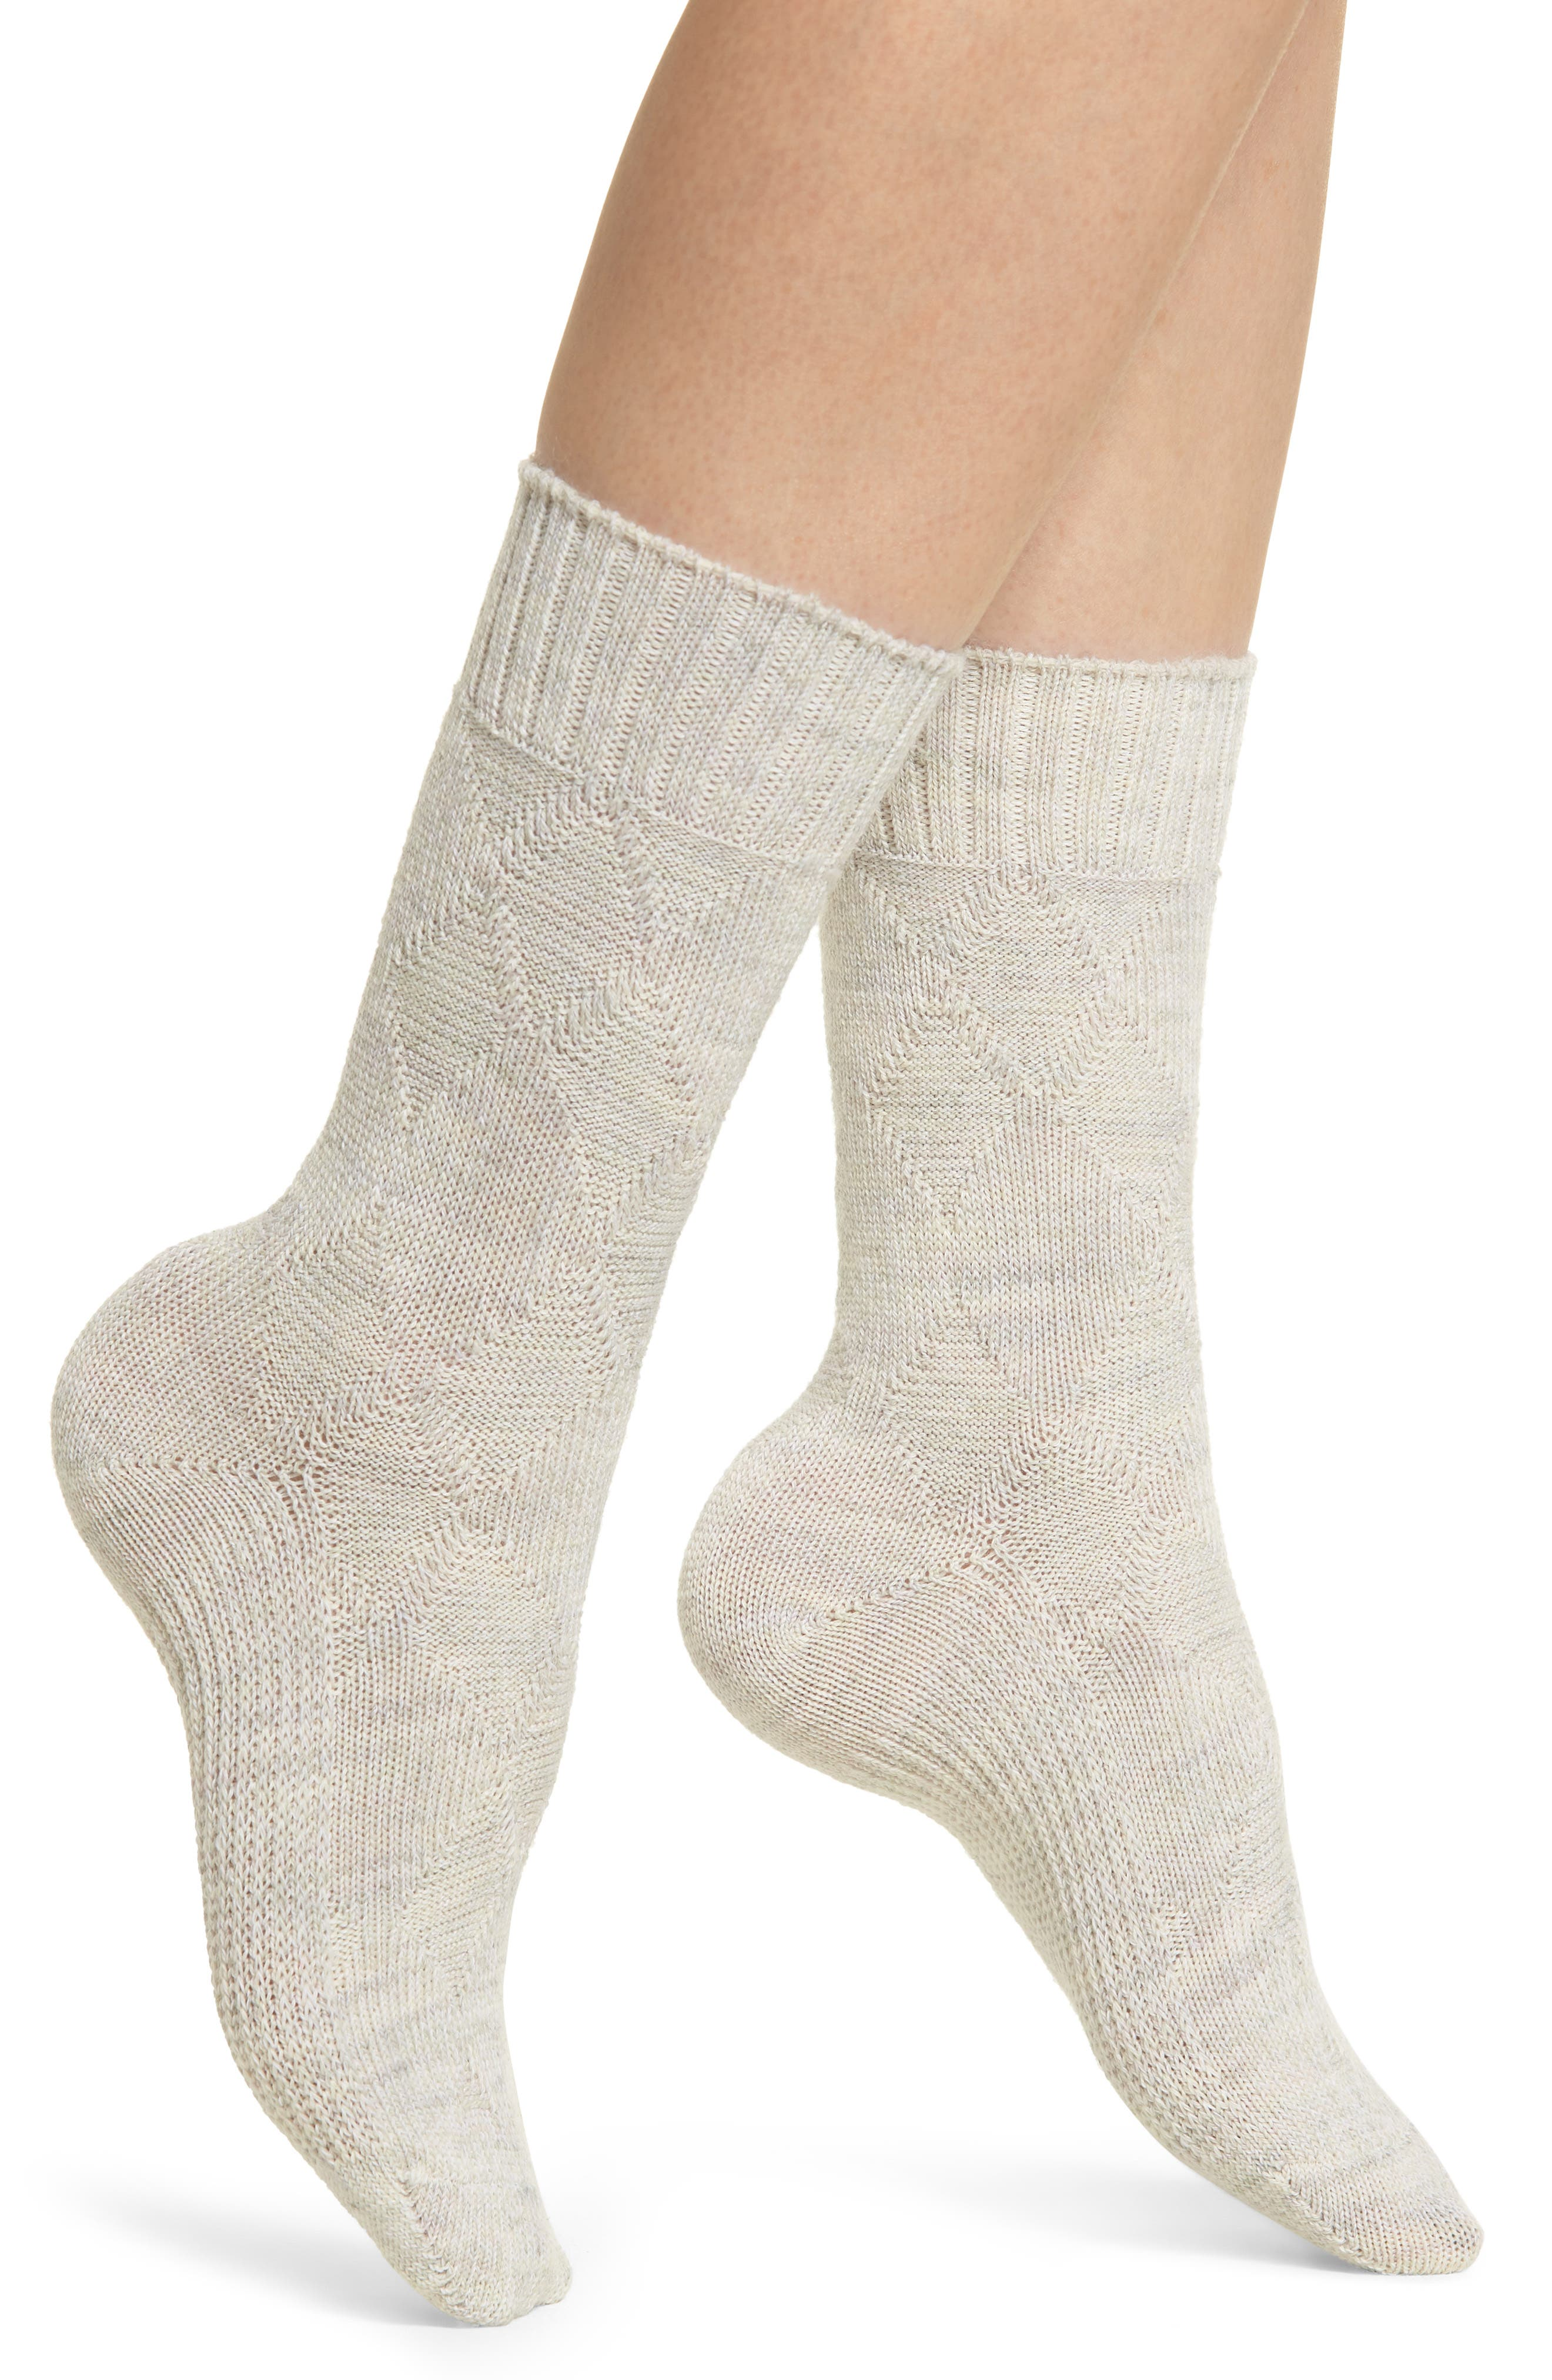 Moonridge Premium Crew Socks,                             Main thumbnail 1, color,                             MOONBEAM HEATHER